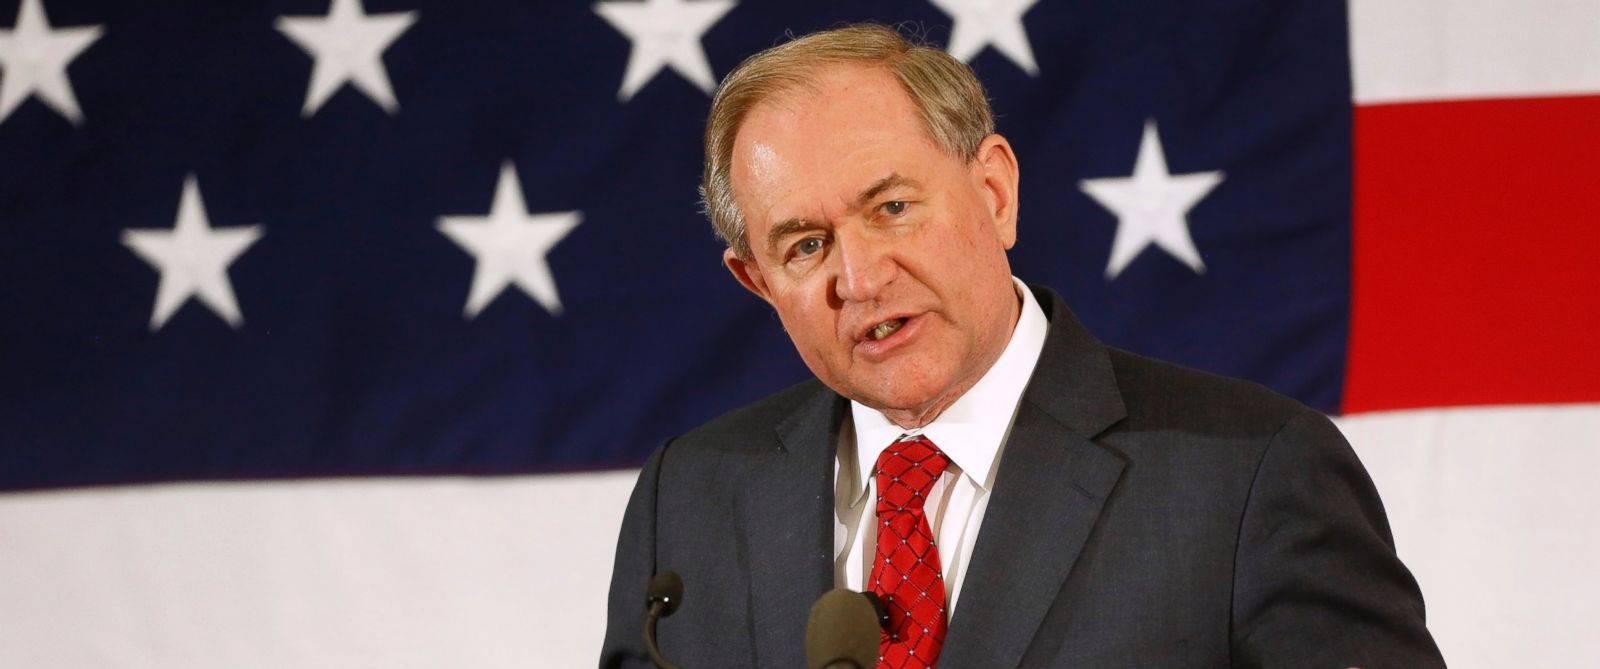 PHOTO: Former Virginia Gov. Jim Gilmore speaks at a Republican Leadership Summit, April 17, 2015, in Nashua, N.H.